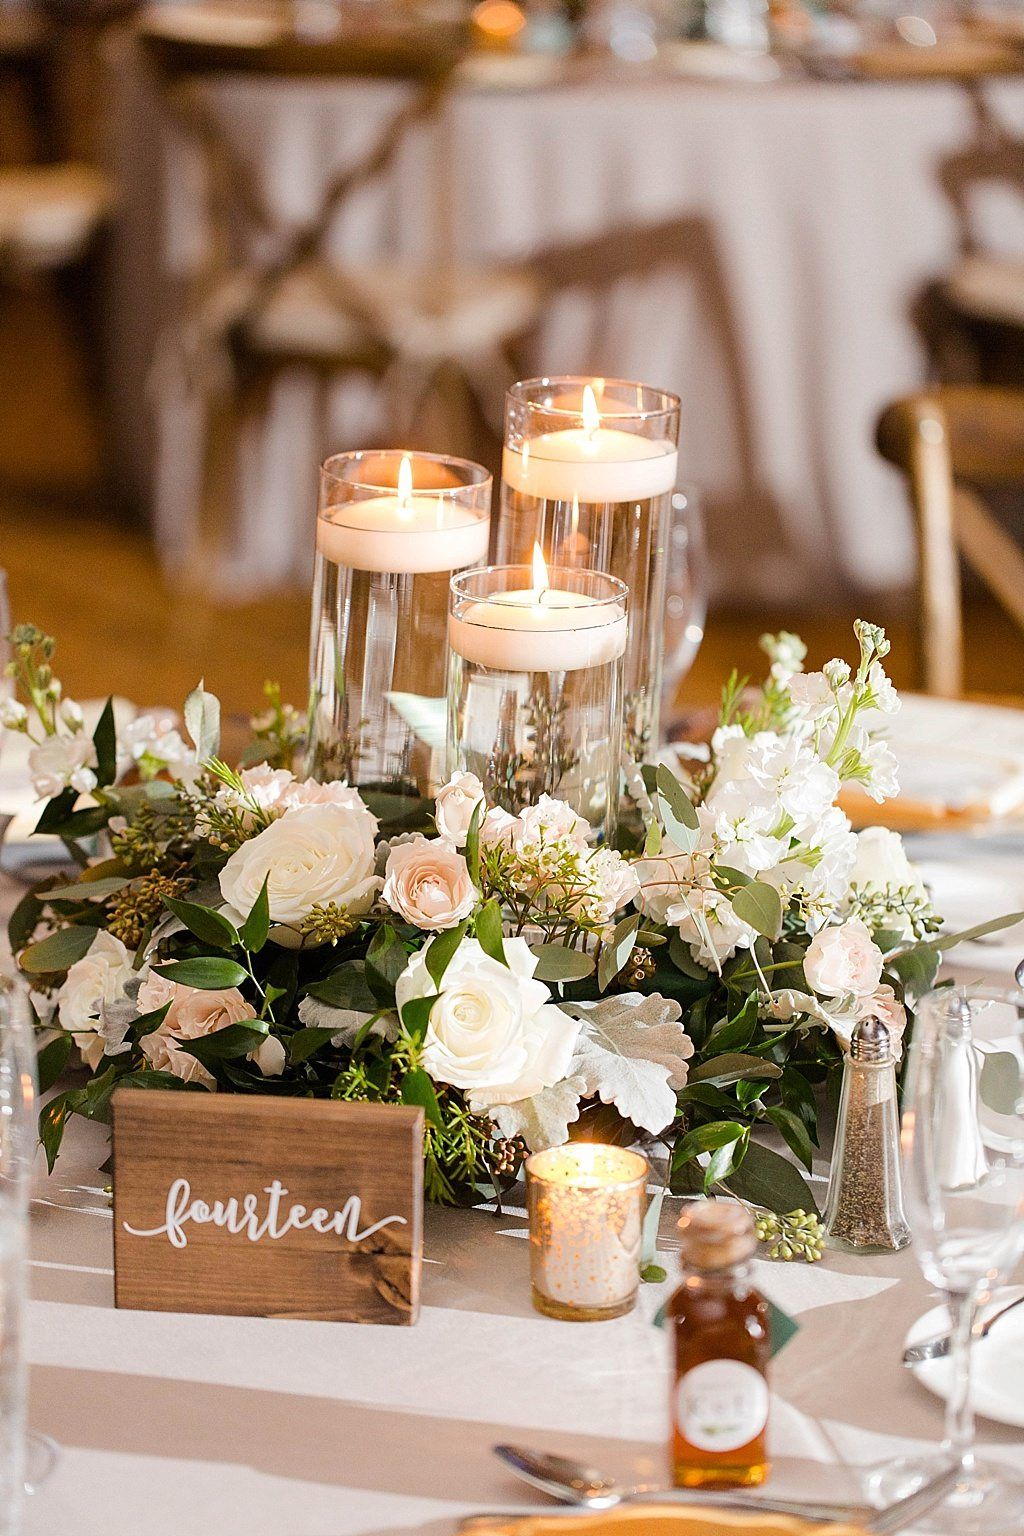 Romantic Farmhouse Inspired Palm Harbor Wedding | Innisbrook Golf and Spa  Resort | Candle wedding centerpieces, Flower centerpieces wedding, Wedding  reception decorations